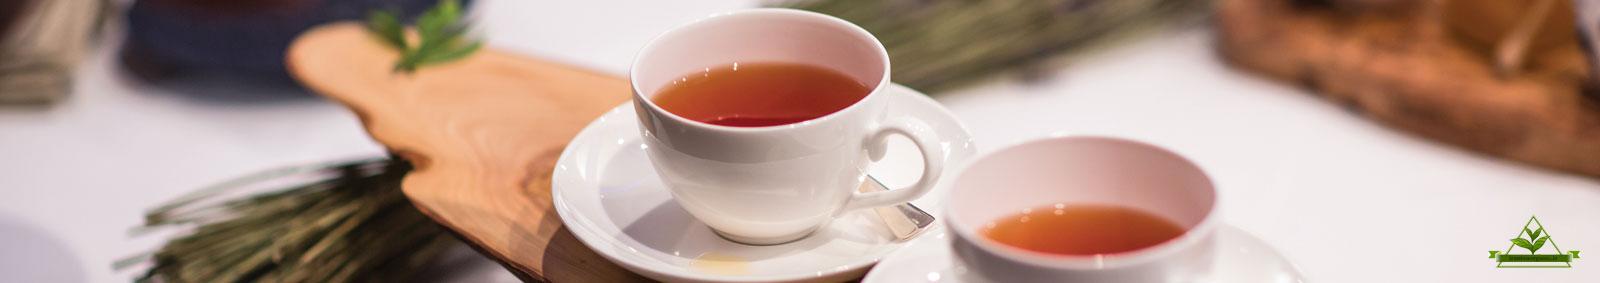 توزیع مستقیم چای شمال